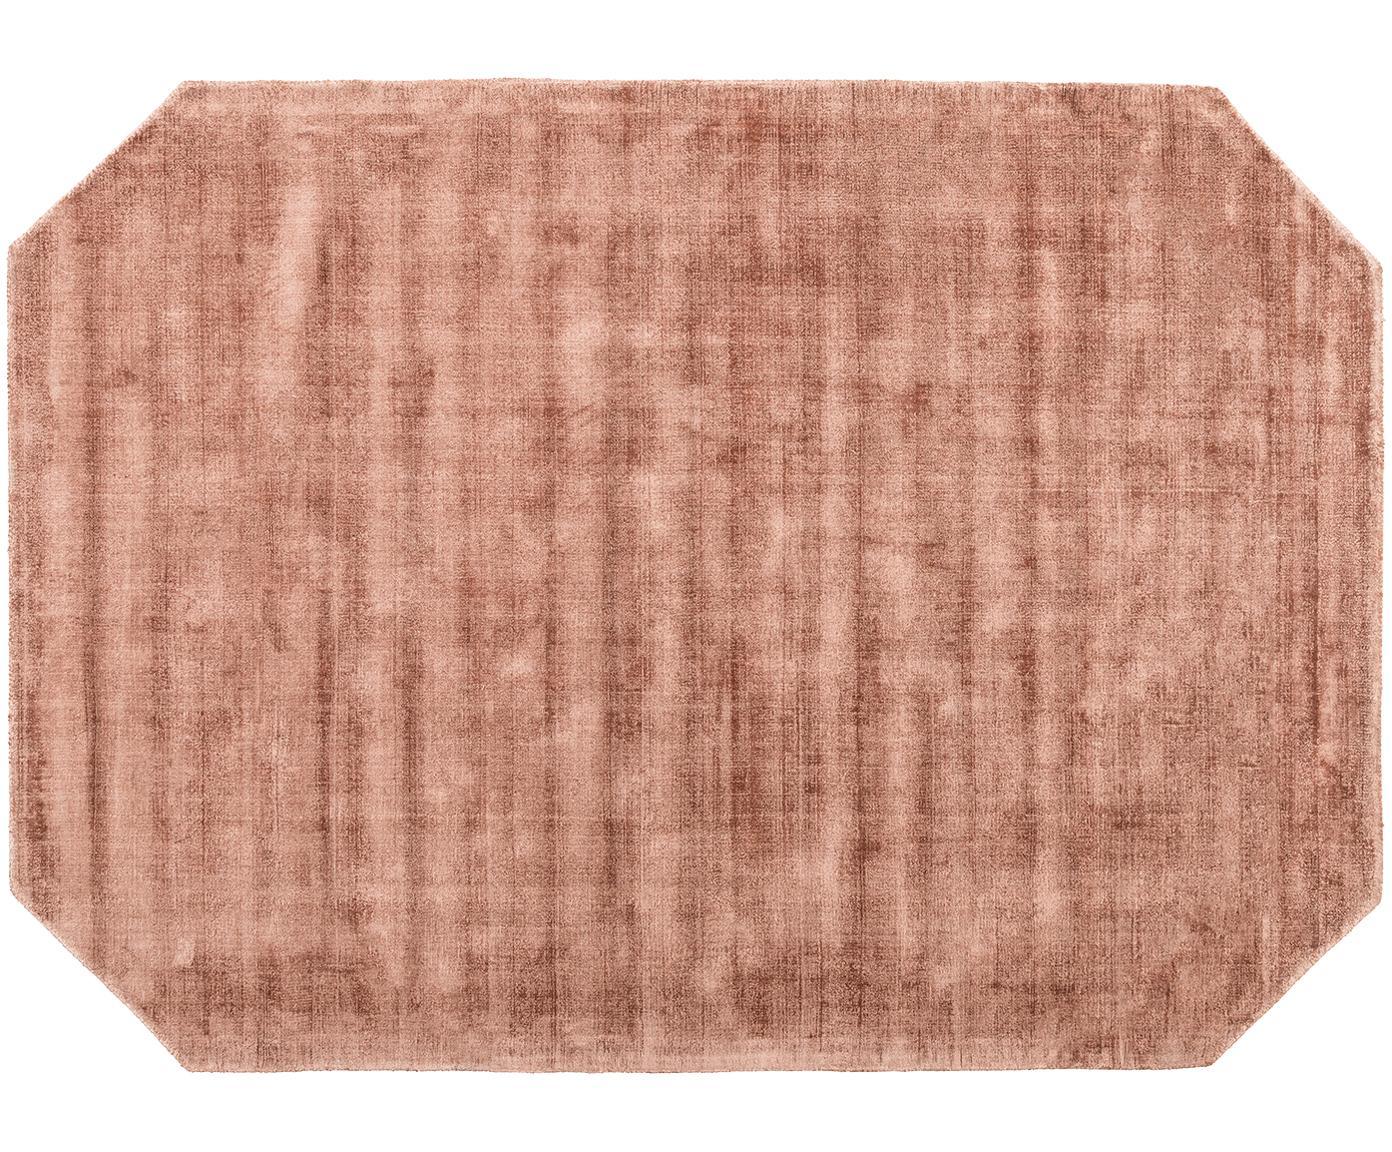 Alfombra artesanal de viscosa Jane Diamond, Parte superior: 100%viscosa, Reverso: 100%algodón, Terracota, An 160 x L 230 cm (Tamaño M)